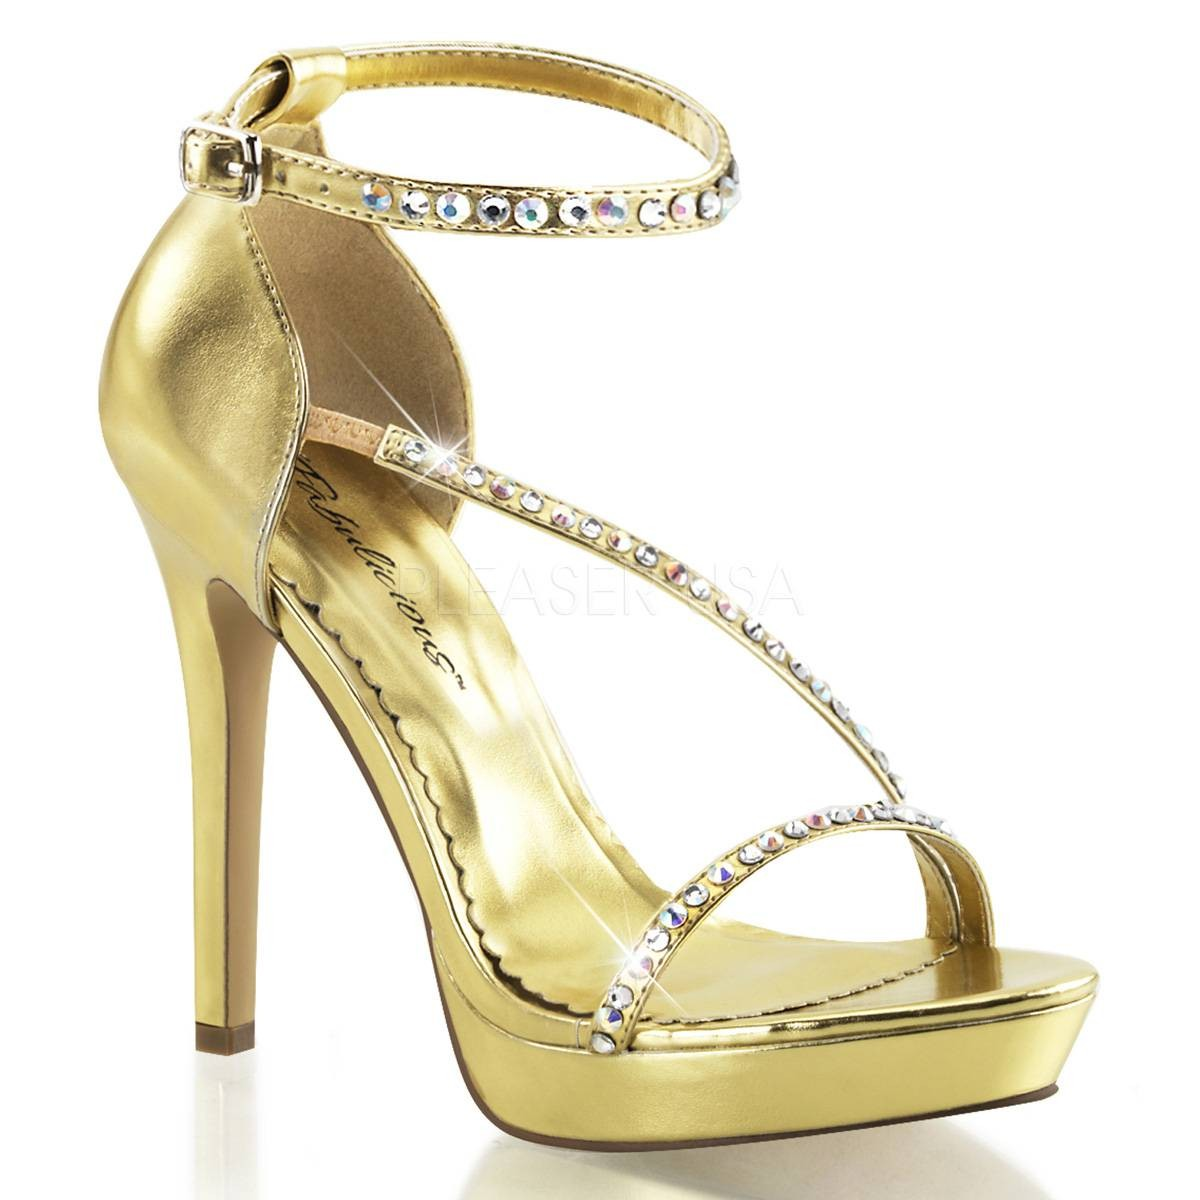 Sandalen für Frauen - LUMINA 26 ° Damen Sandalette ° Gold Matt ° Fabulicious  - Onlineshop RedSixty